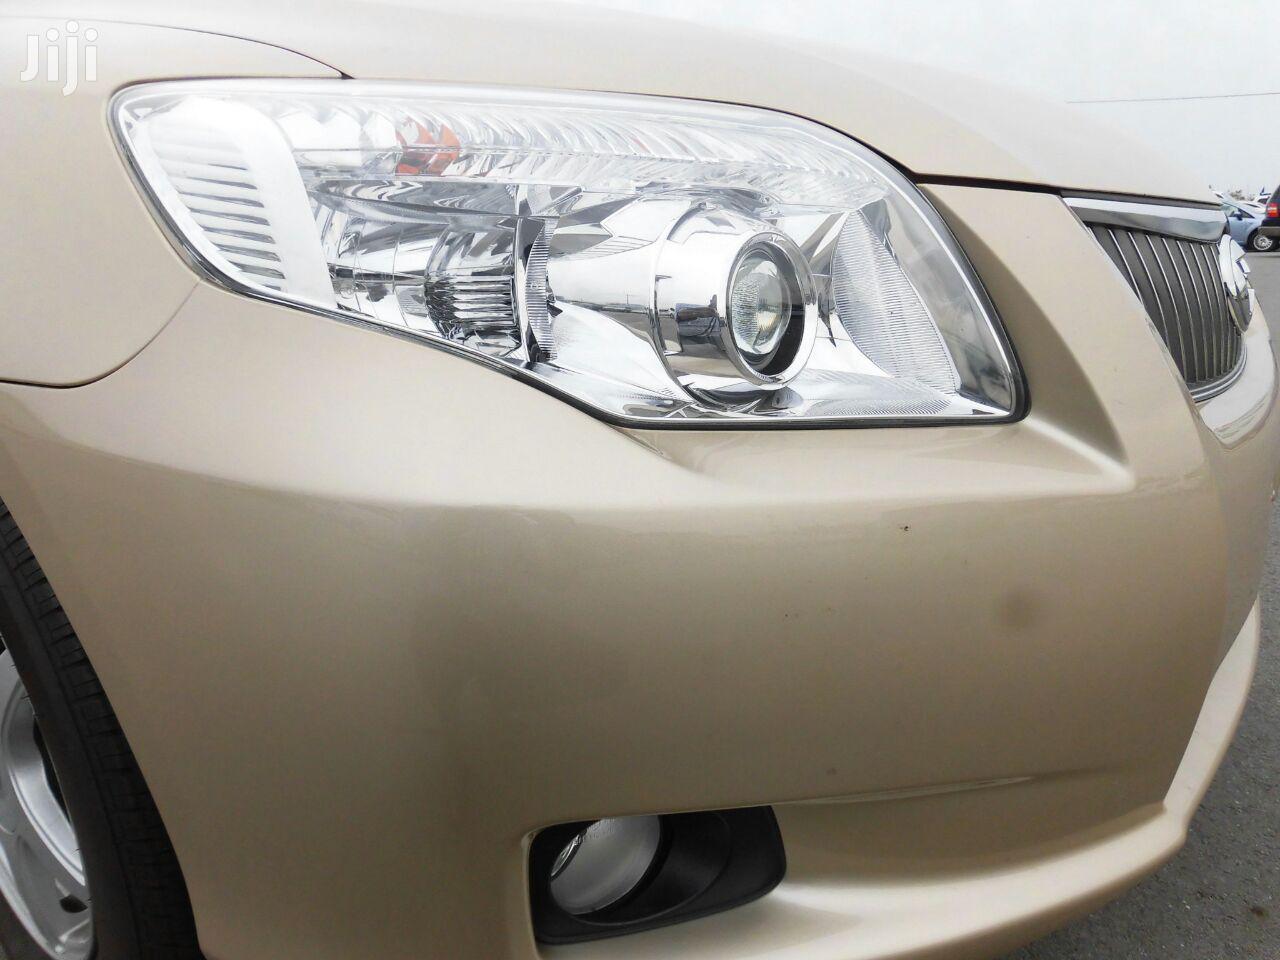 New Toyota Corolla 2012 Gold | Cars for sale in Tononoka, Mombasa, Kenya